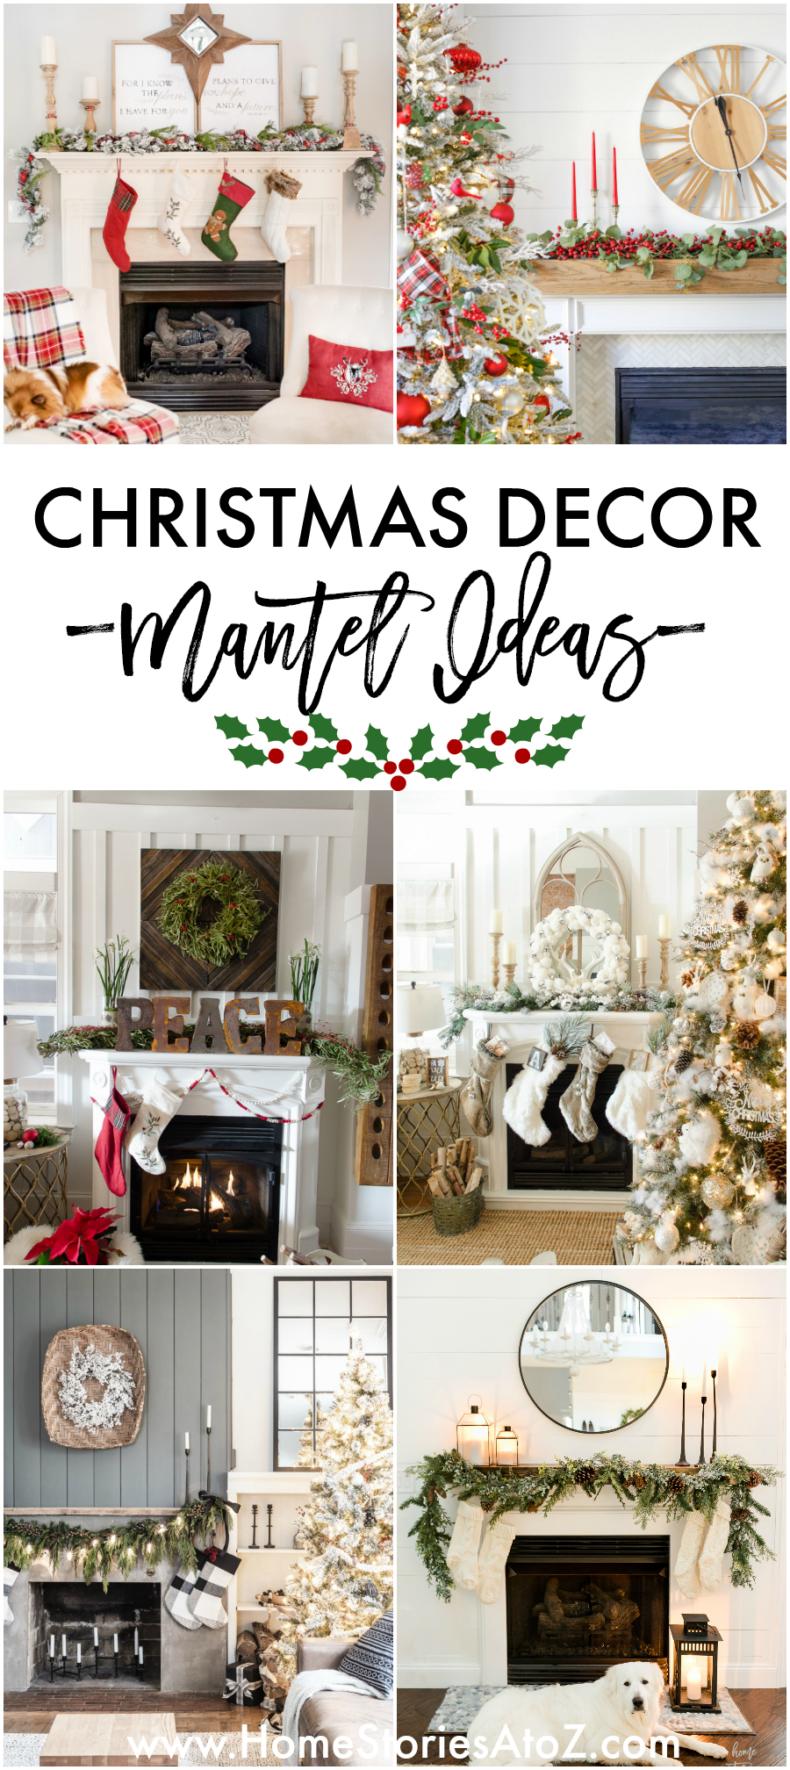 Christmas Decor - Mantel Ideas